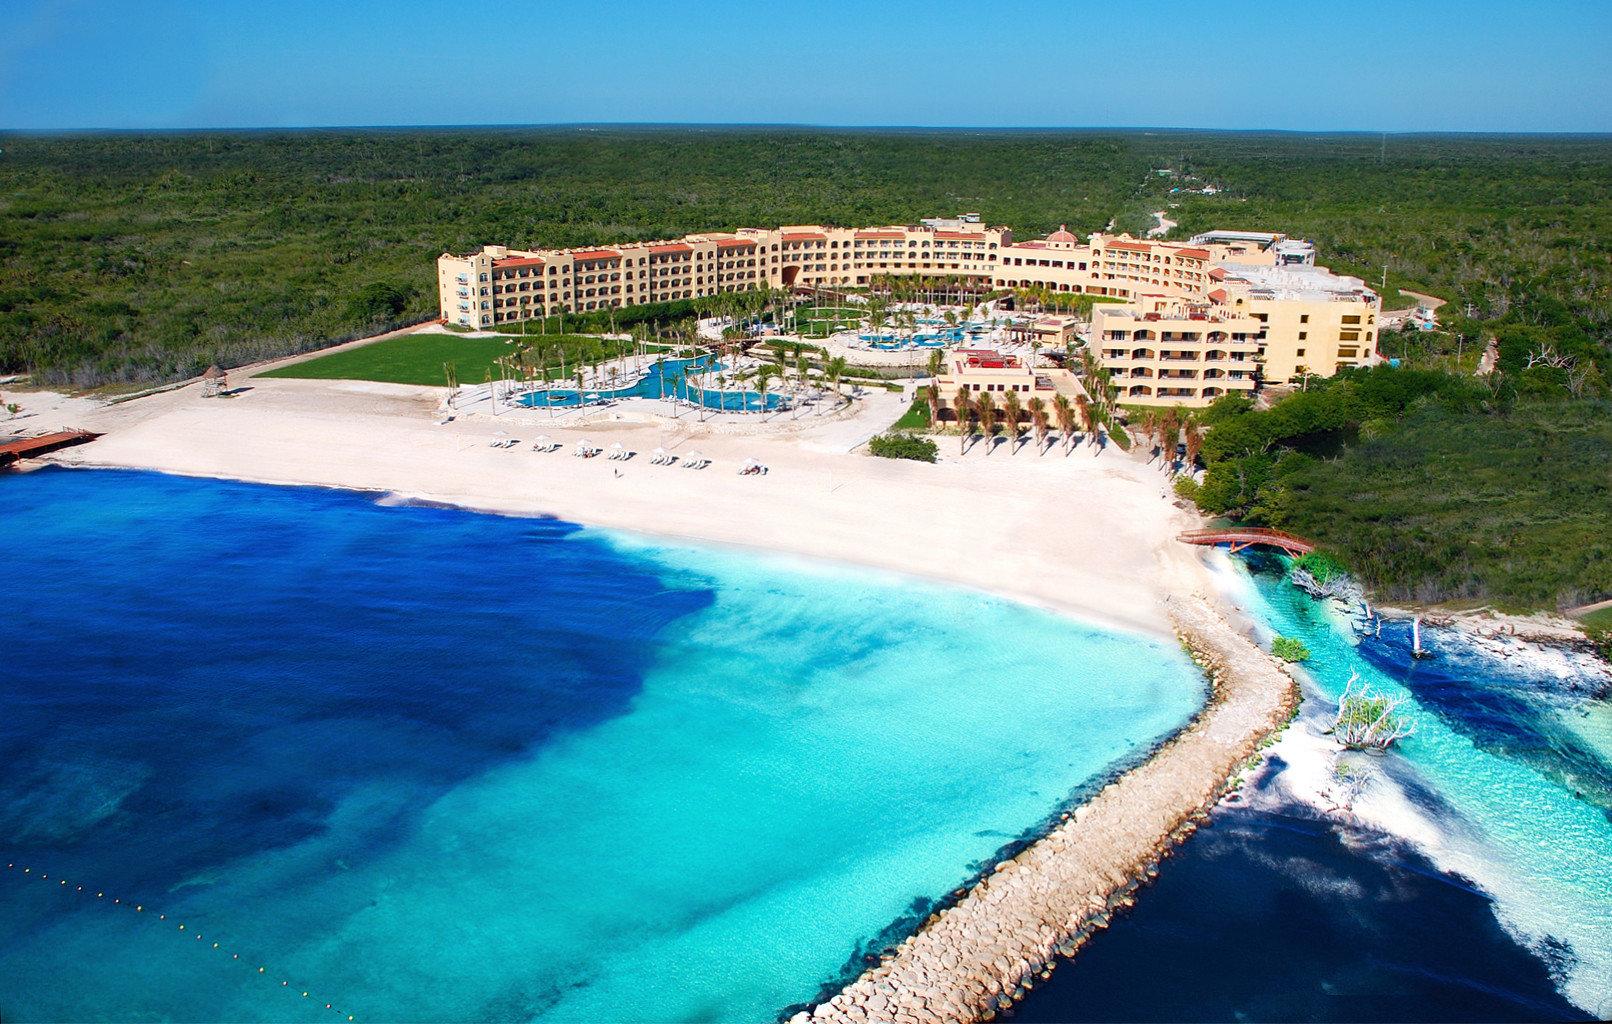 sky swimming pool Sea Beach Coast Ocean Nature Resort caribbean Lagoon Water park cape Island blue shore sandy